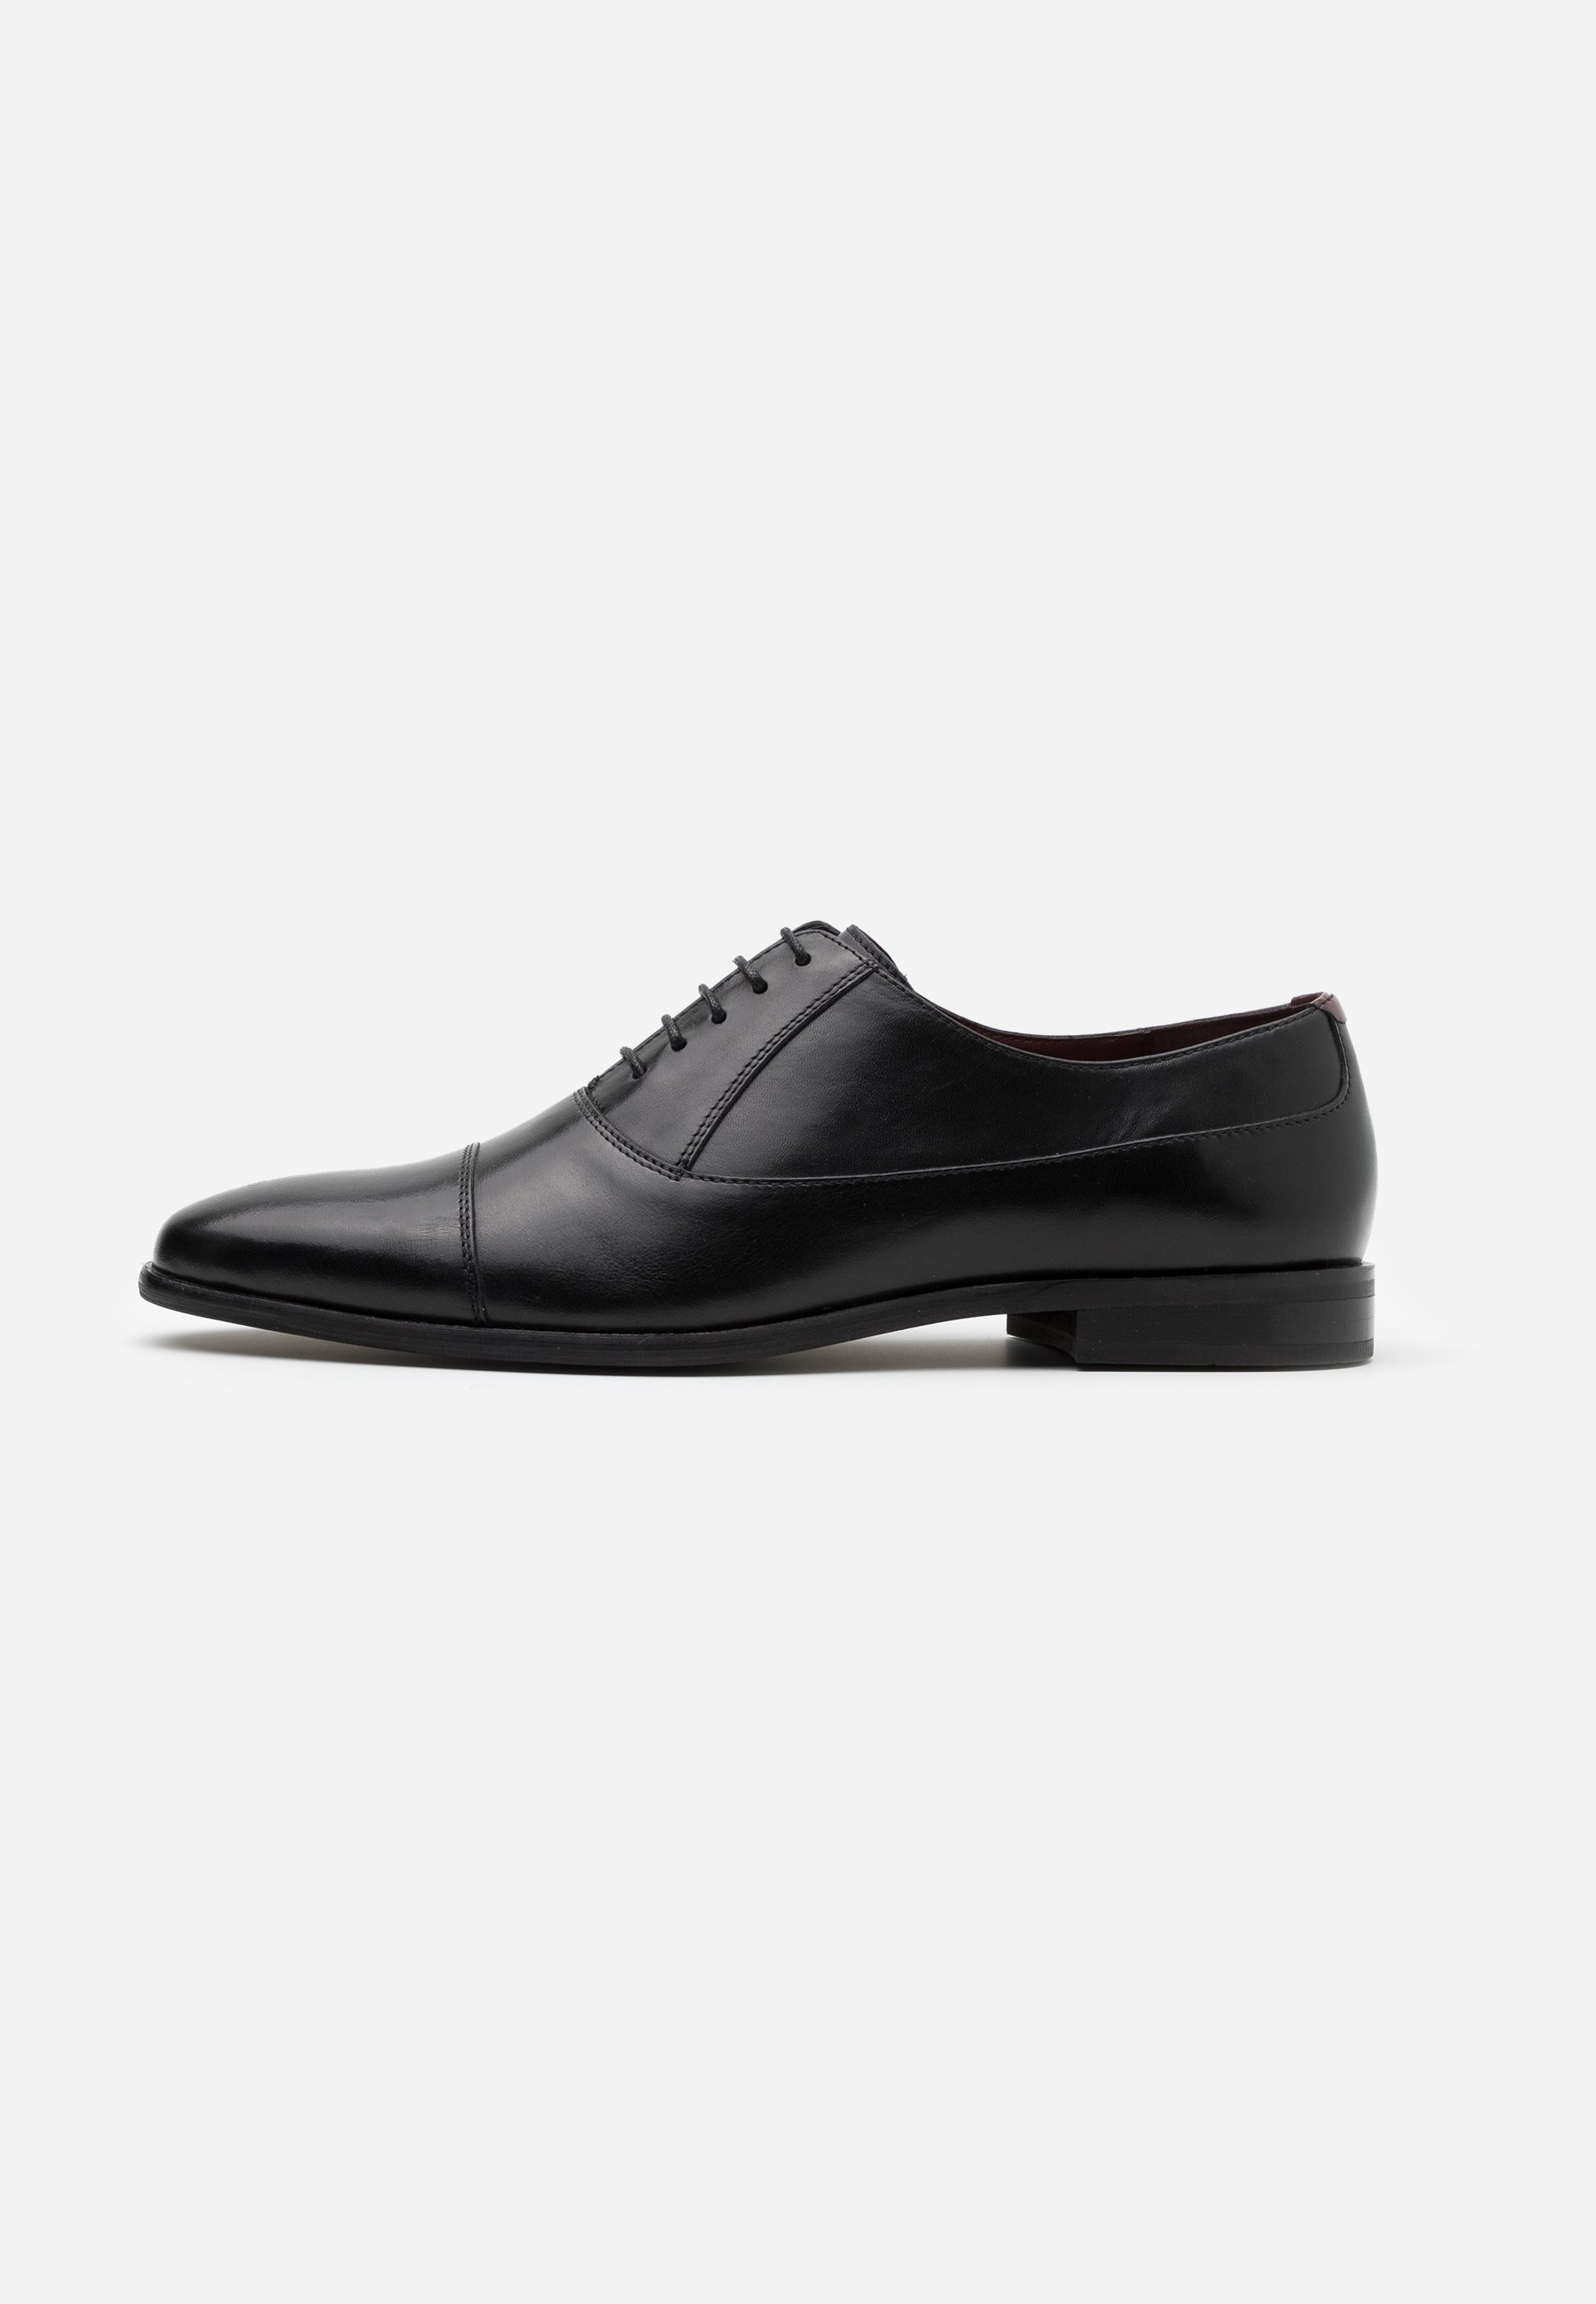 Herrer ALFIE OXFORD TOE-CAP - Business sko - black